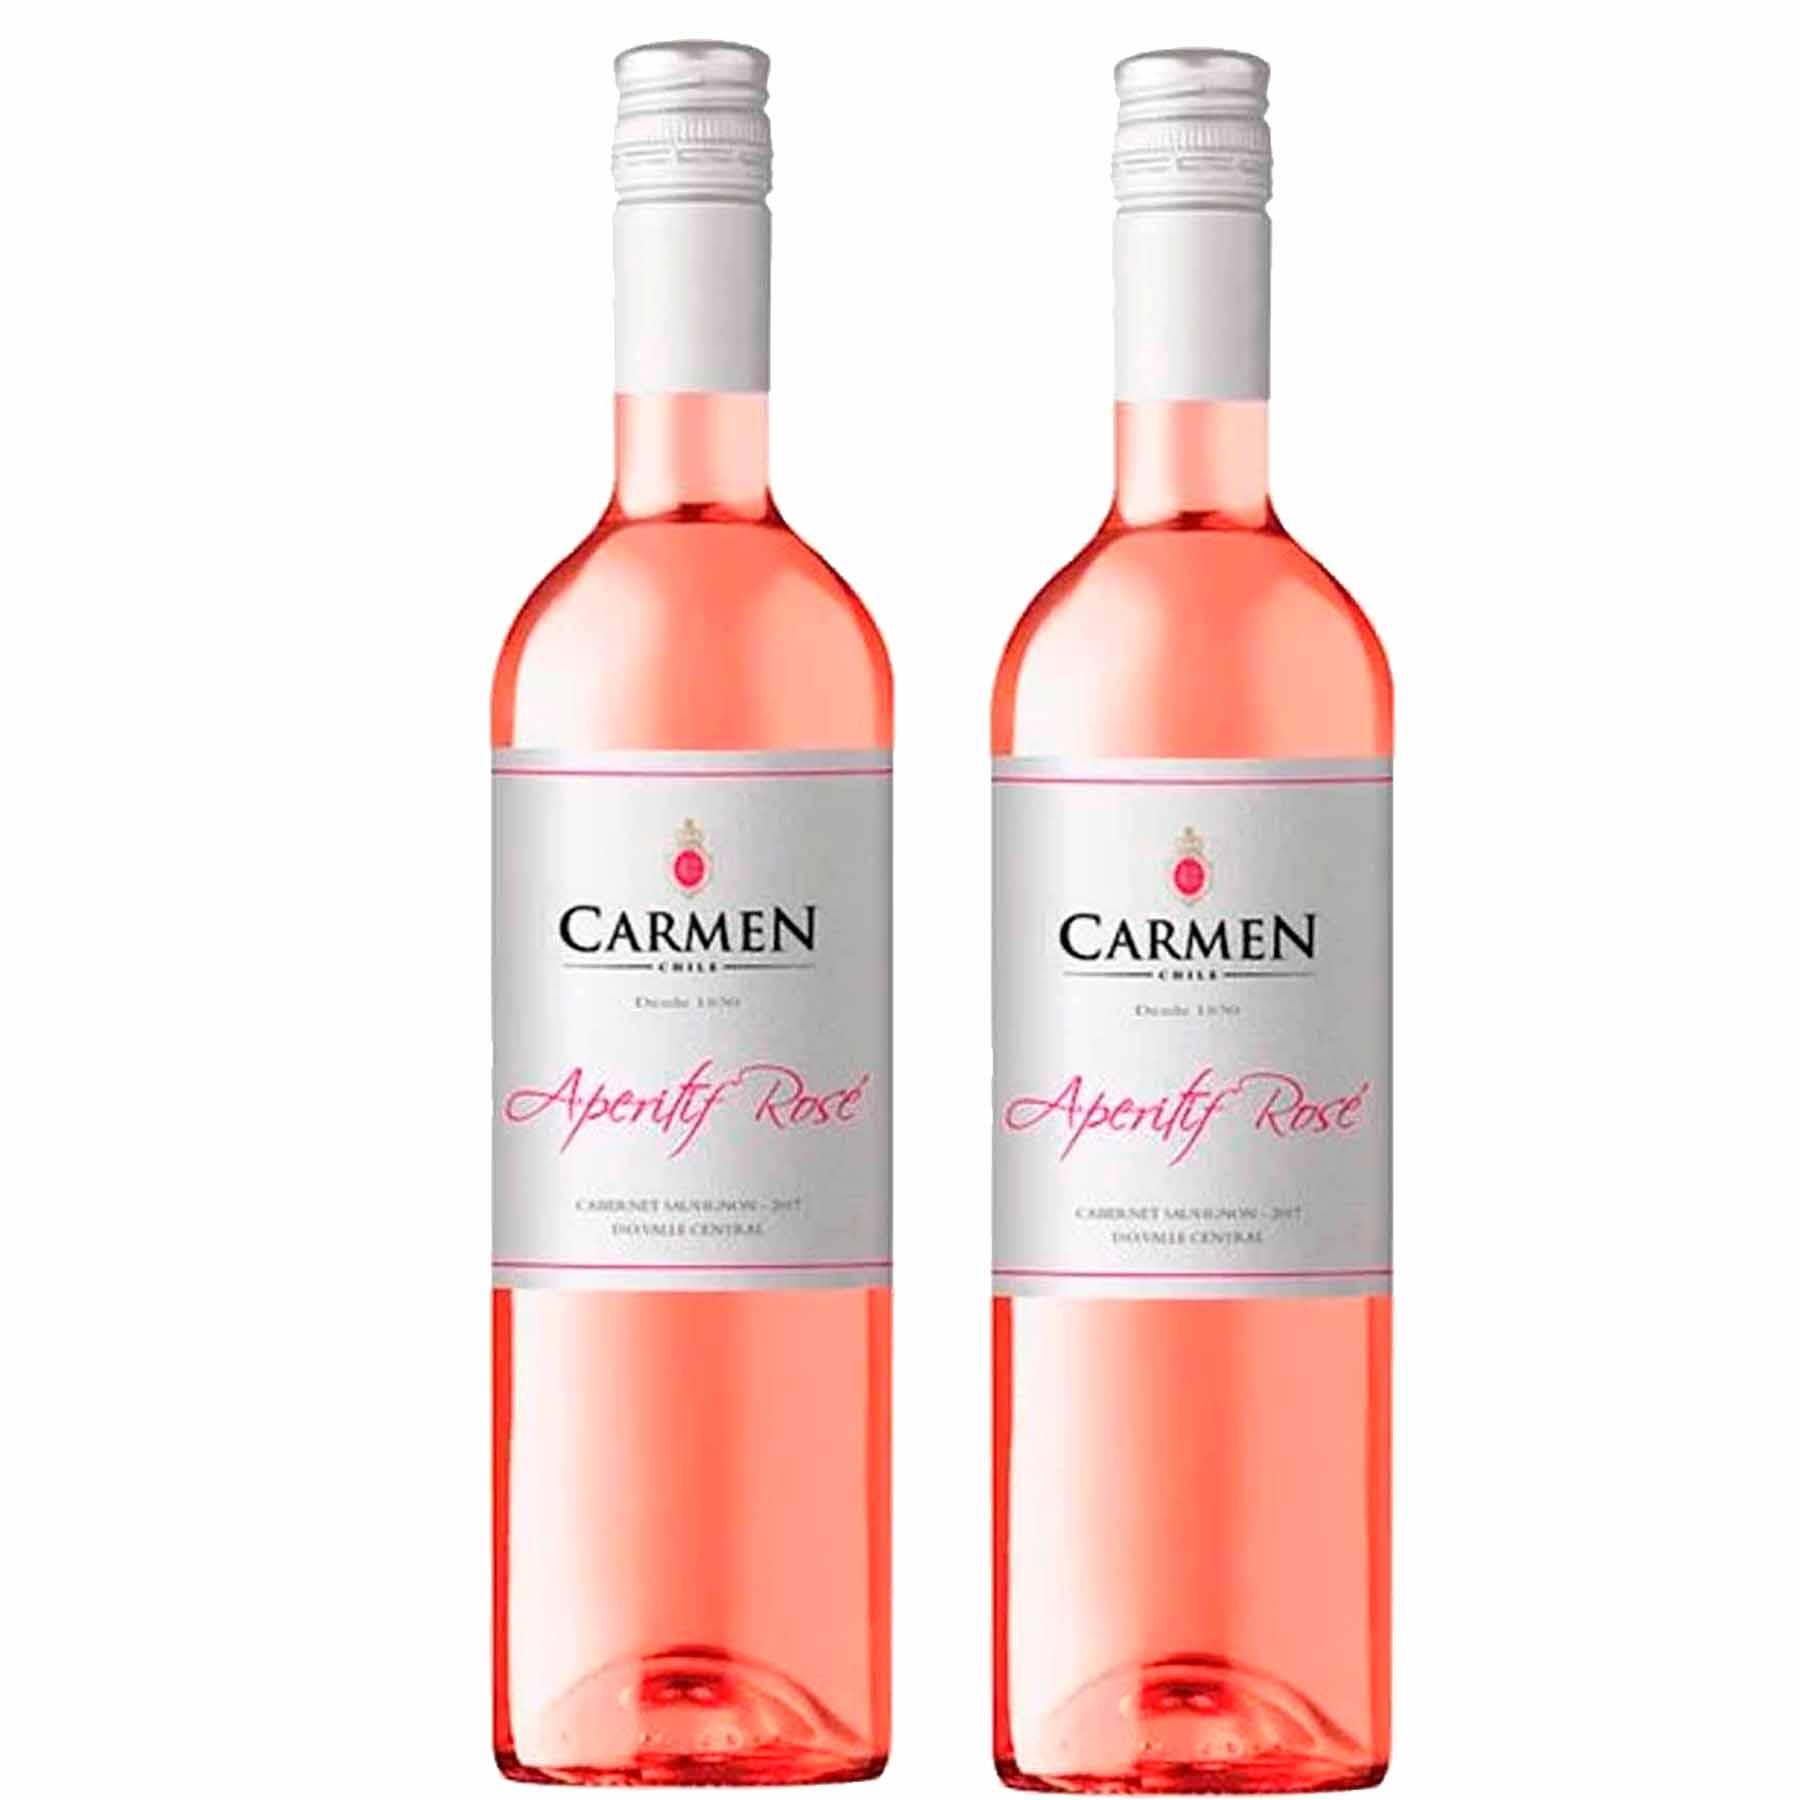 Kit 2x Vinho Rose Chileno Carmen Insigne Aperitif Cabernet Sauvignon 2019